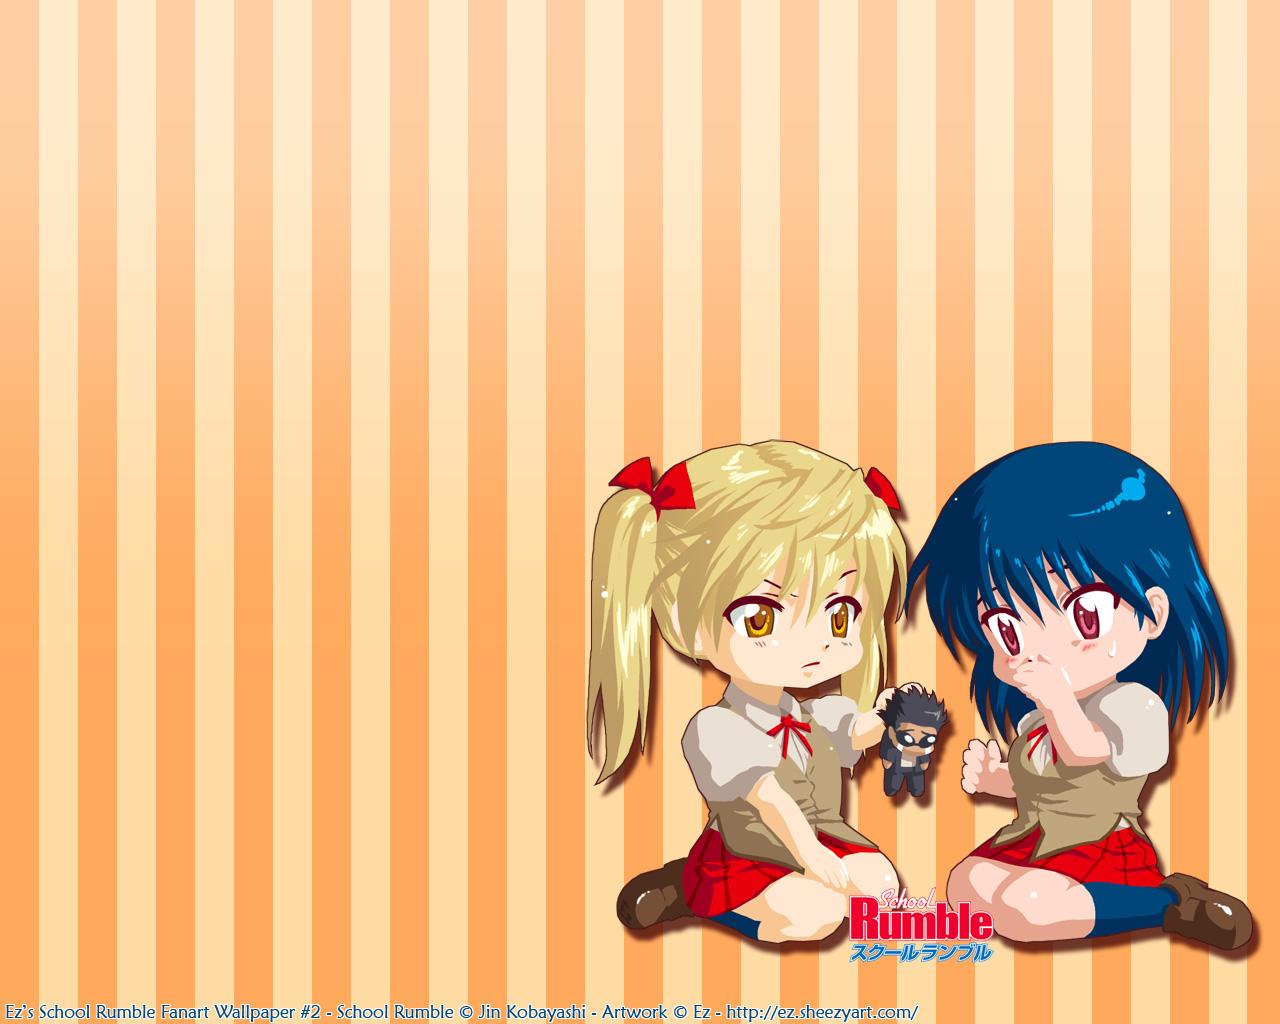 Pompom Ezu chan School Rumble Wallpaper jpg 1280x1024